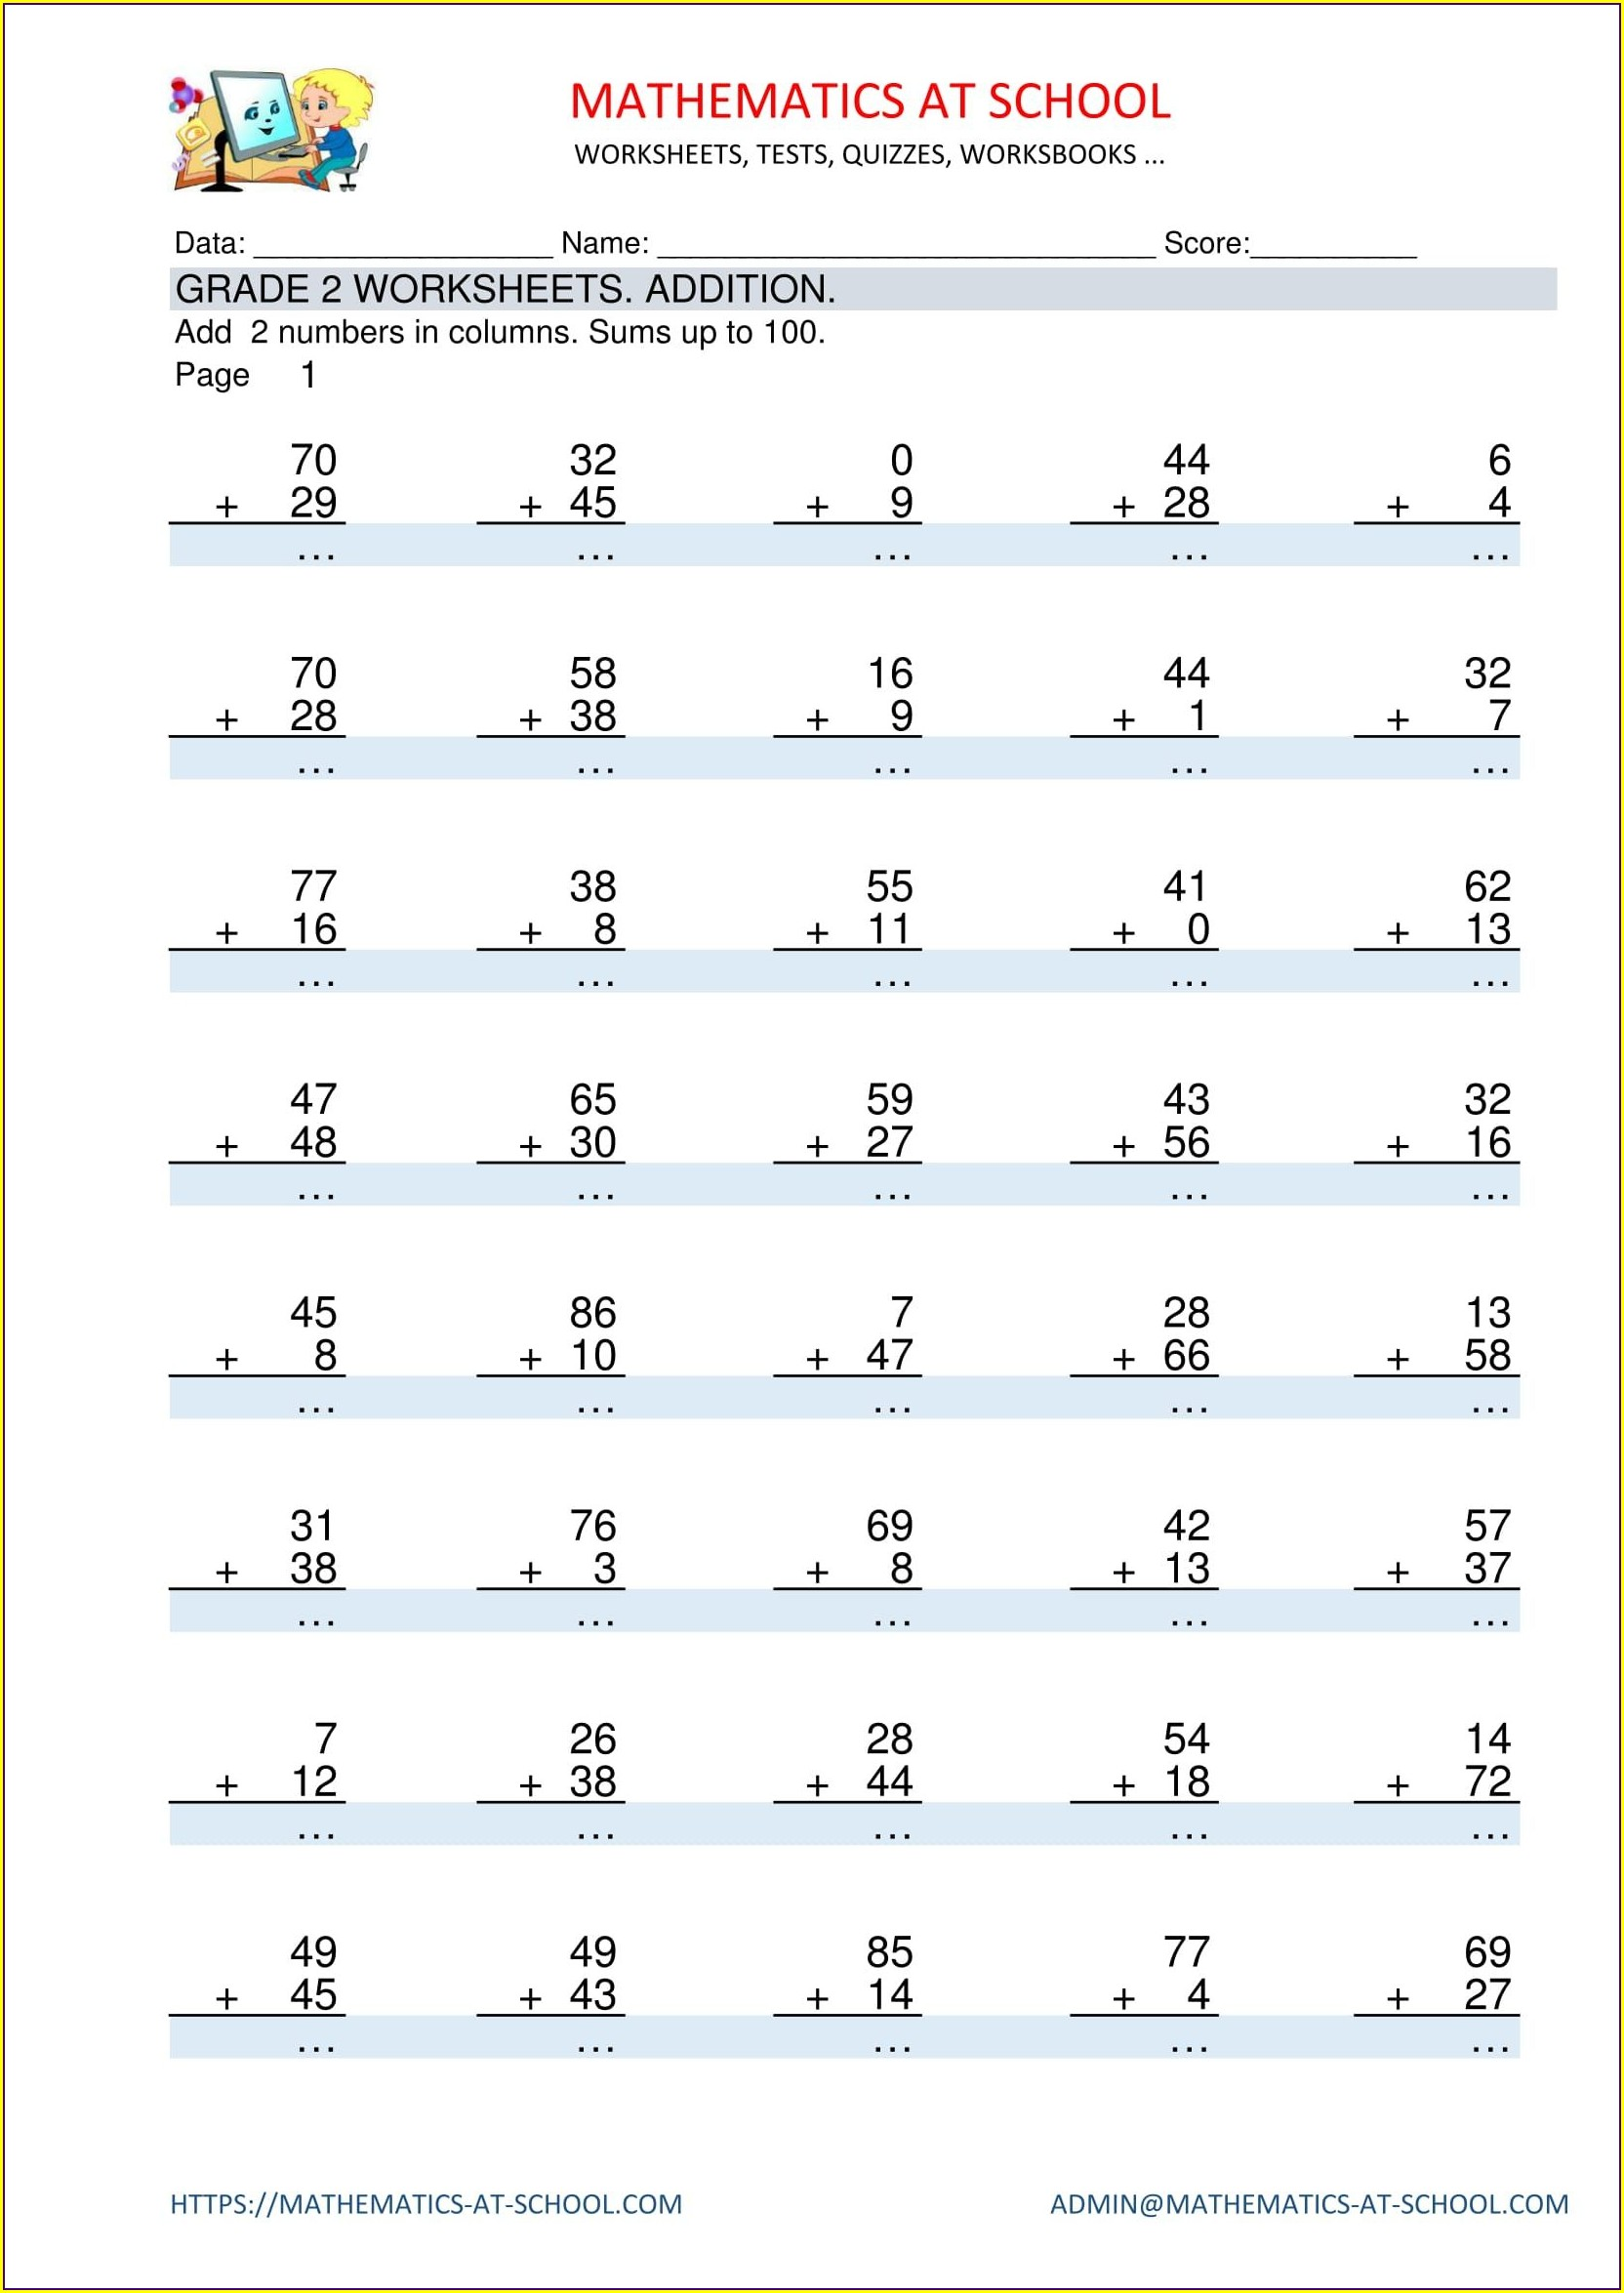 Mathematics Worksheet For Grade 2